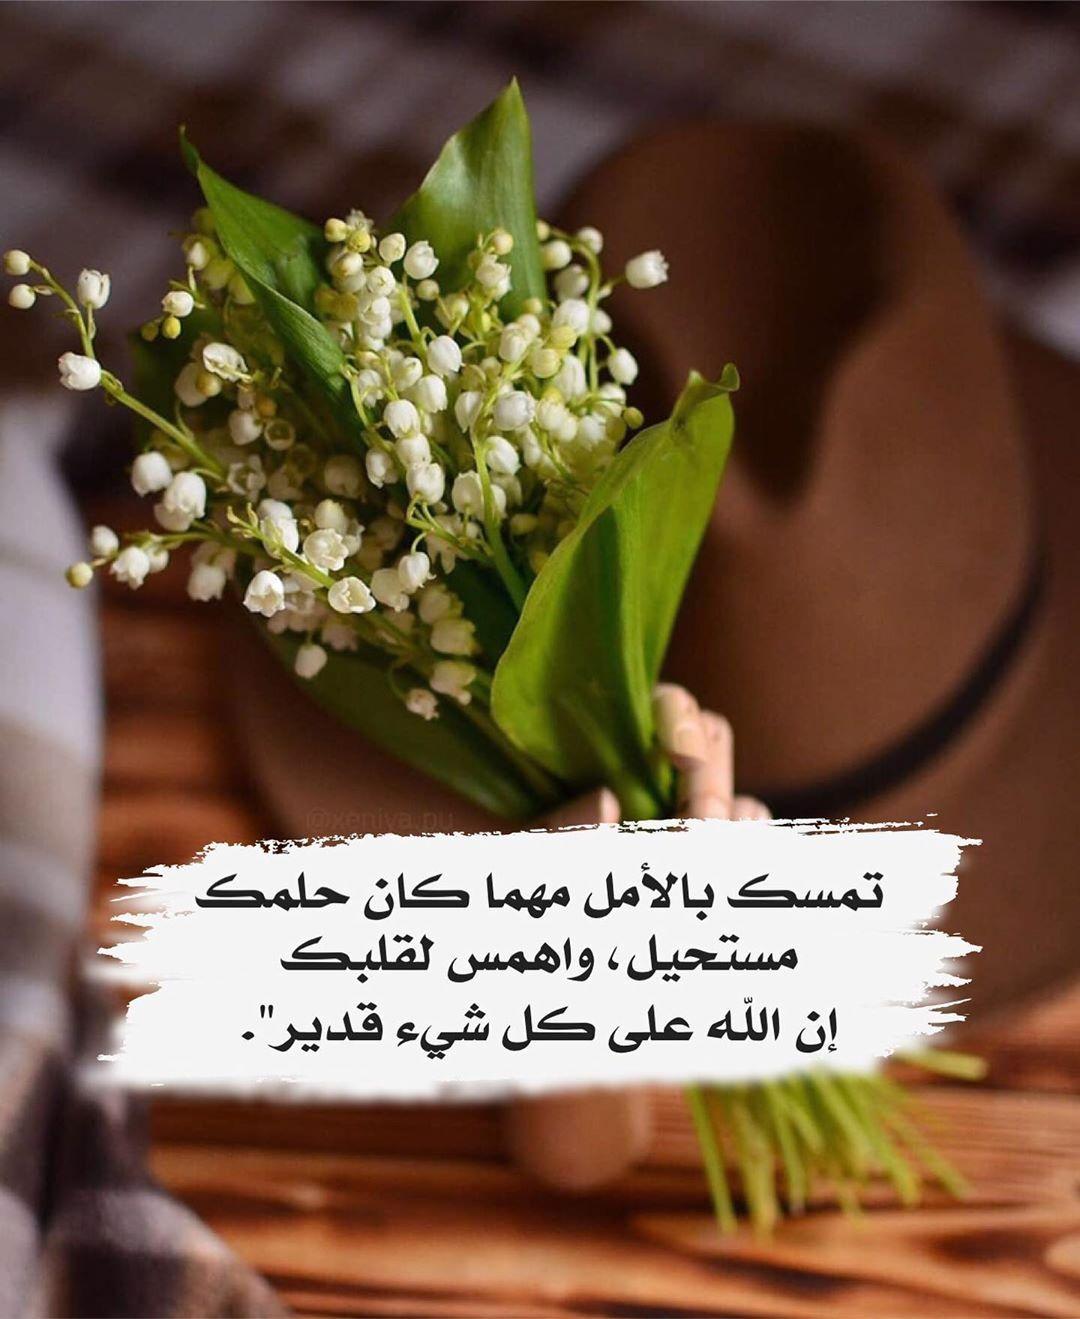 Aljanah On Instagram أذكار إسلامية ديني دين اسلام اسلامي هاشتاق اذكار صور رمزيات خلفيات تذكير دن Islamic Quotes Quran Herbs Islamic Quotes